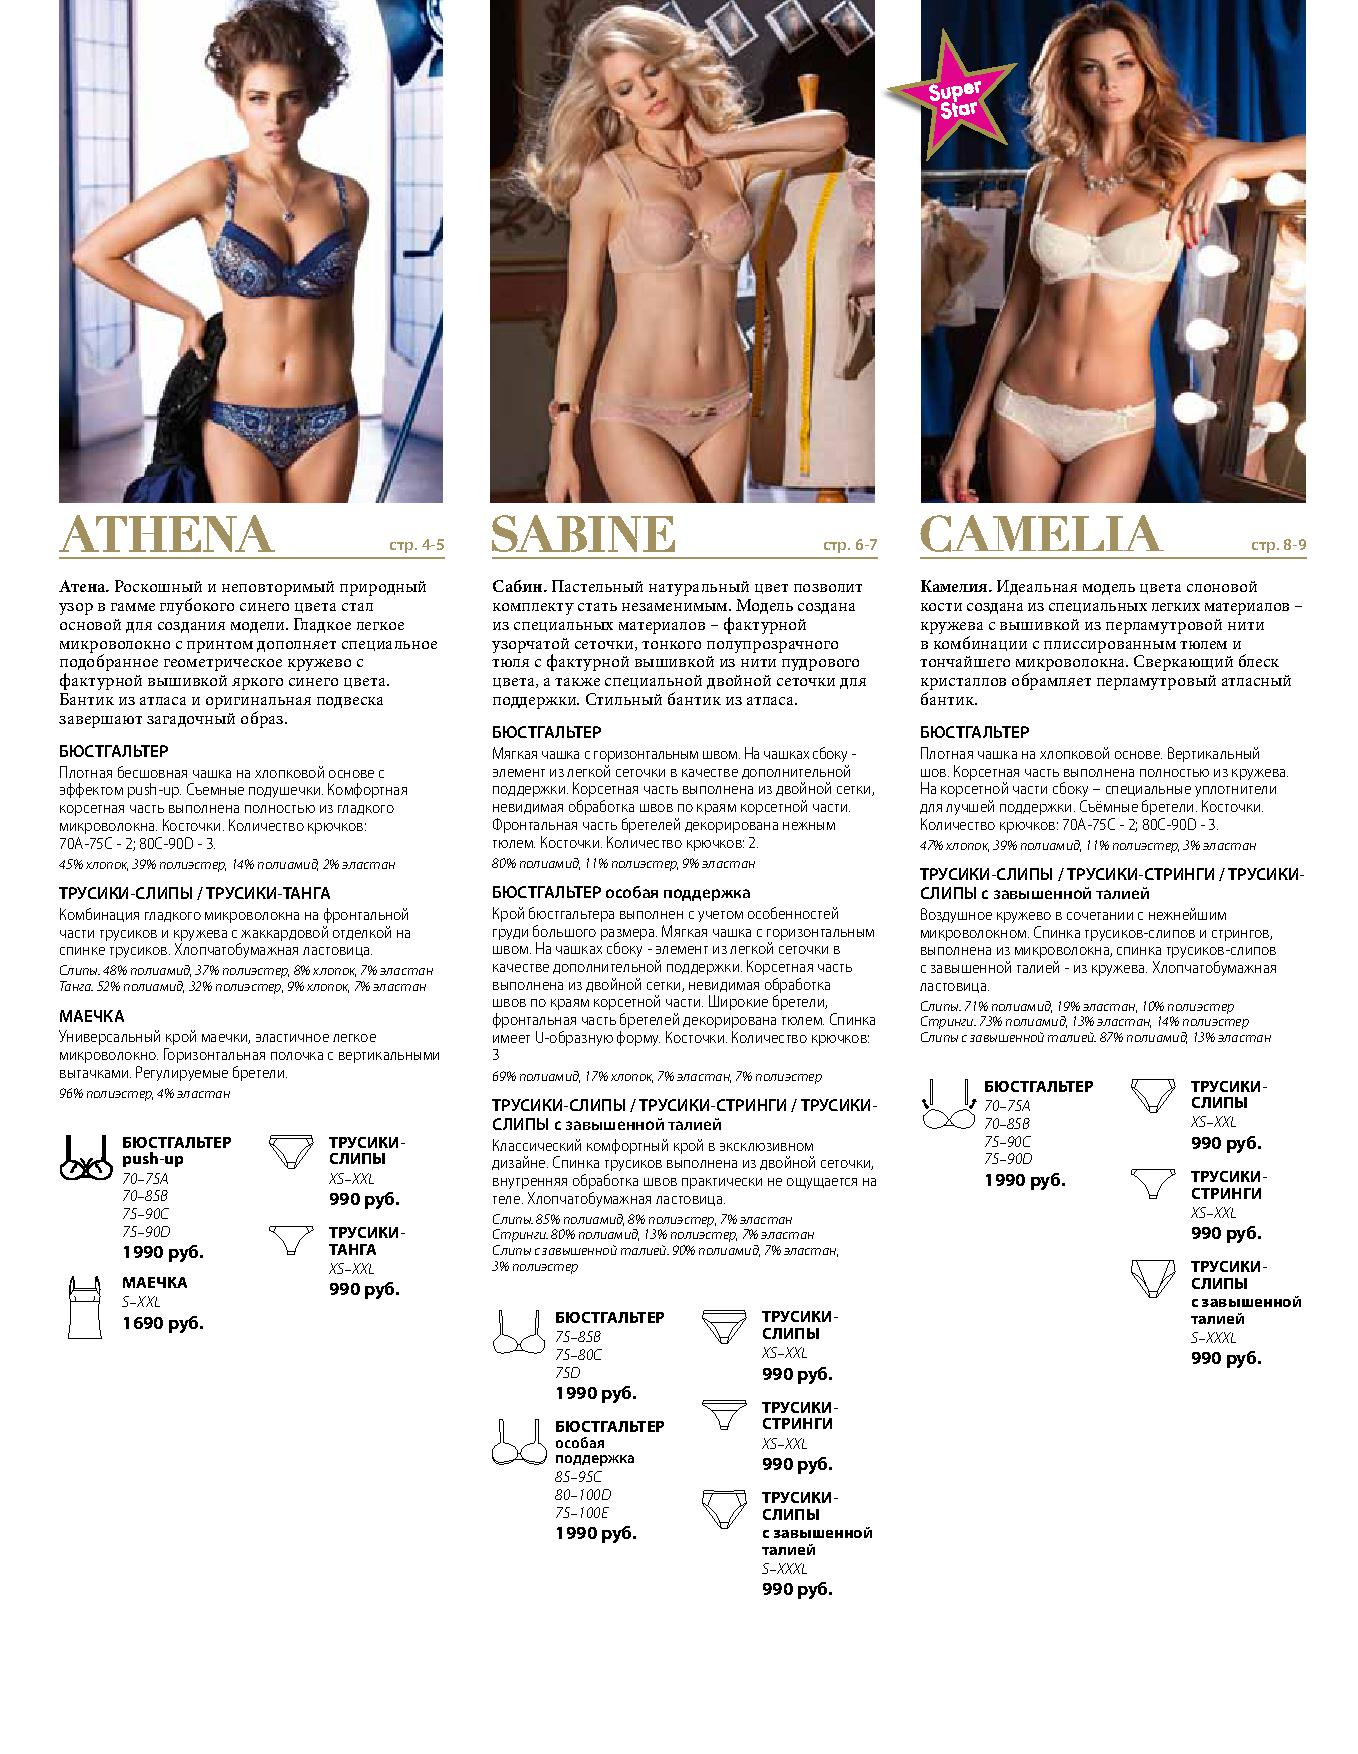 Описание комплектов каталога стр. 4-9